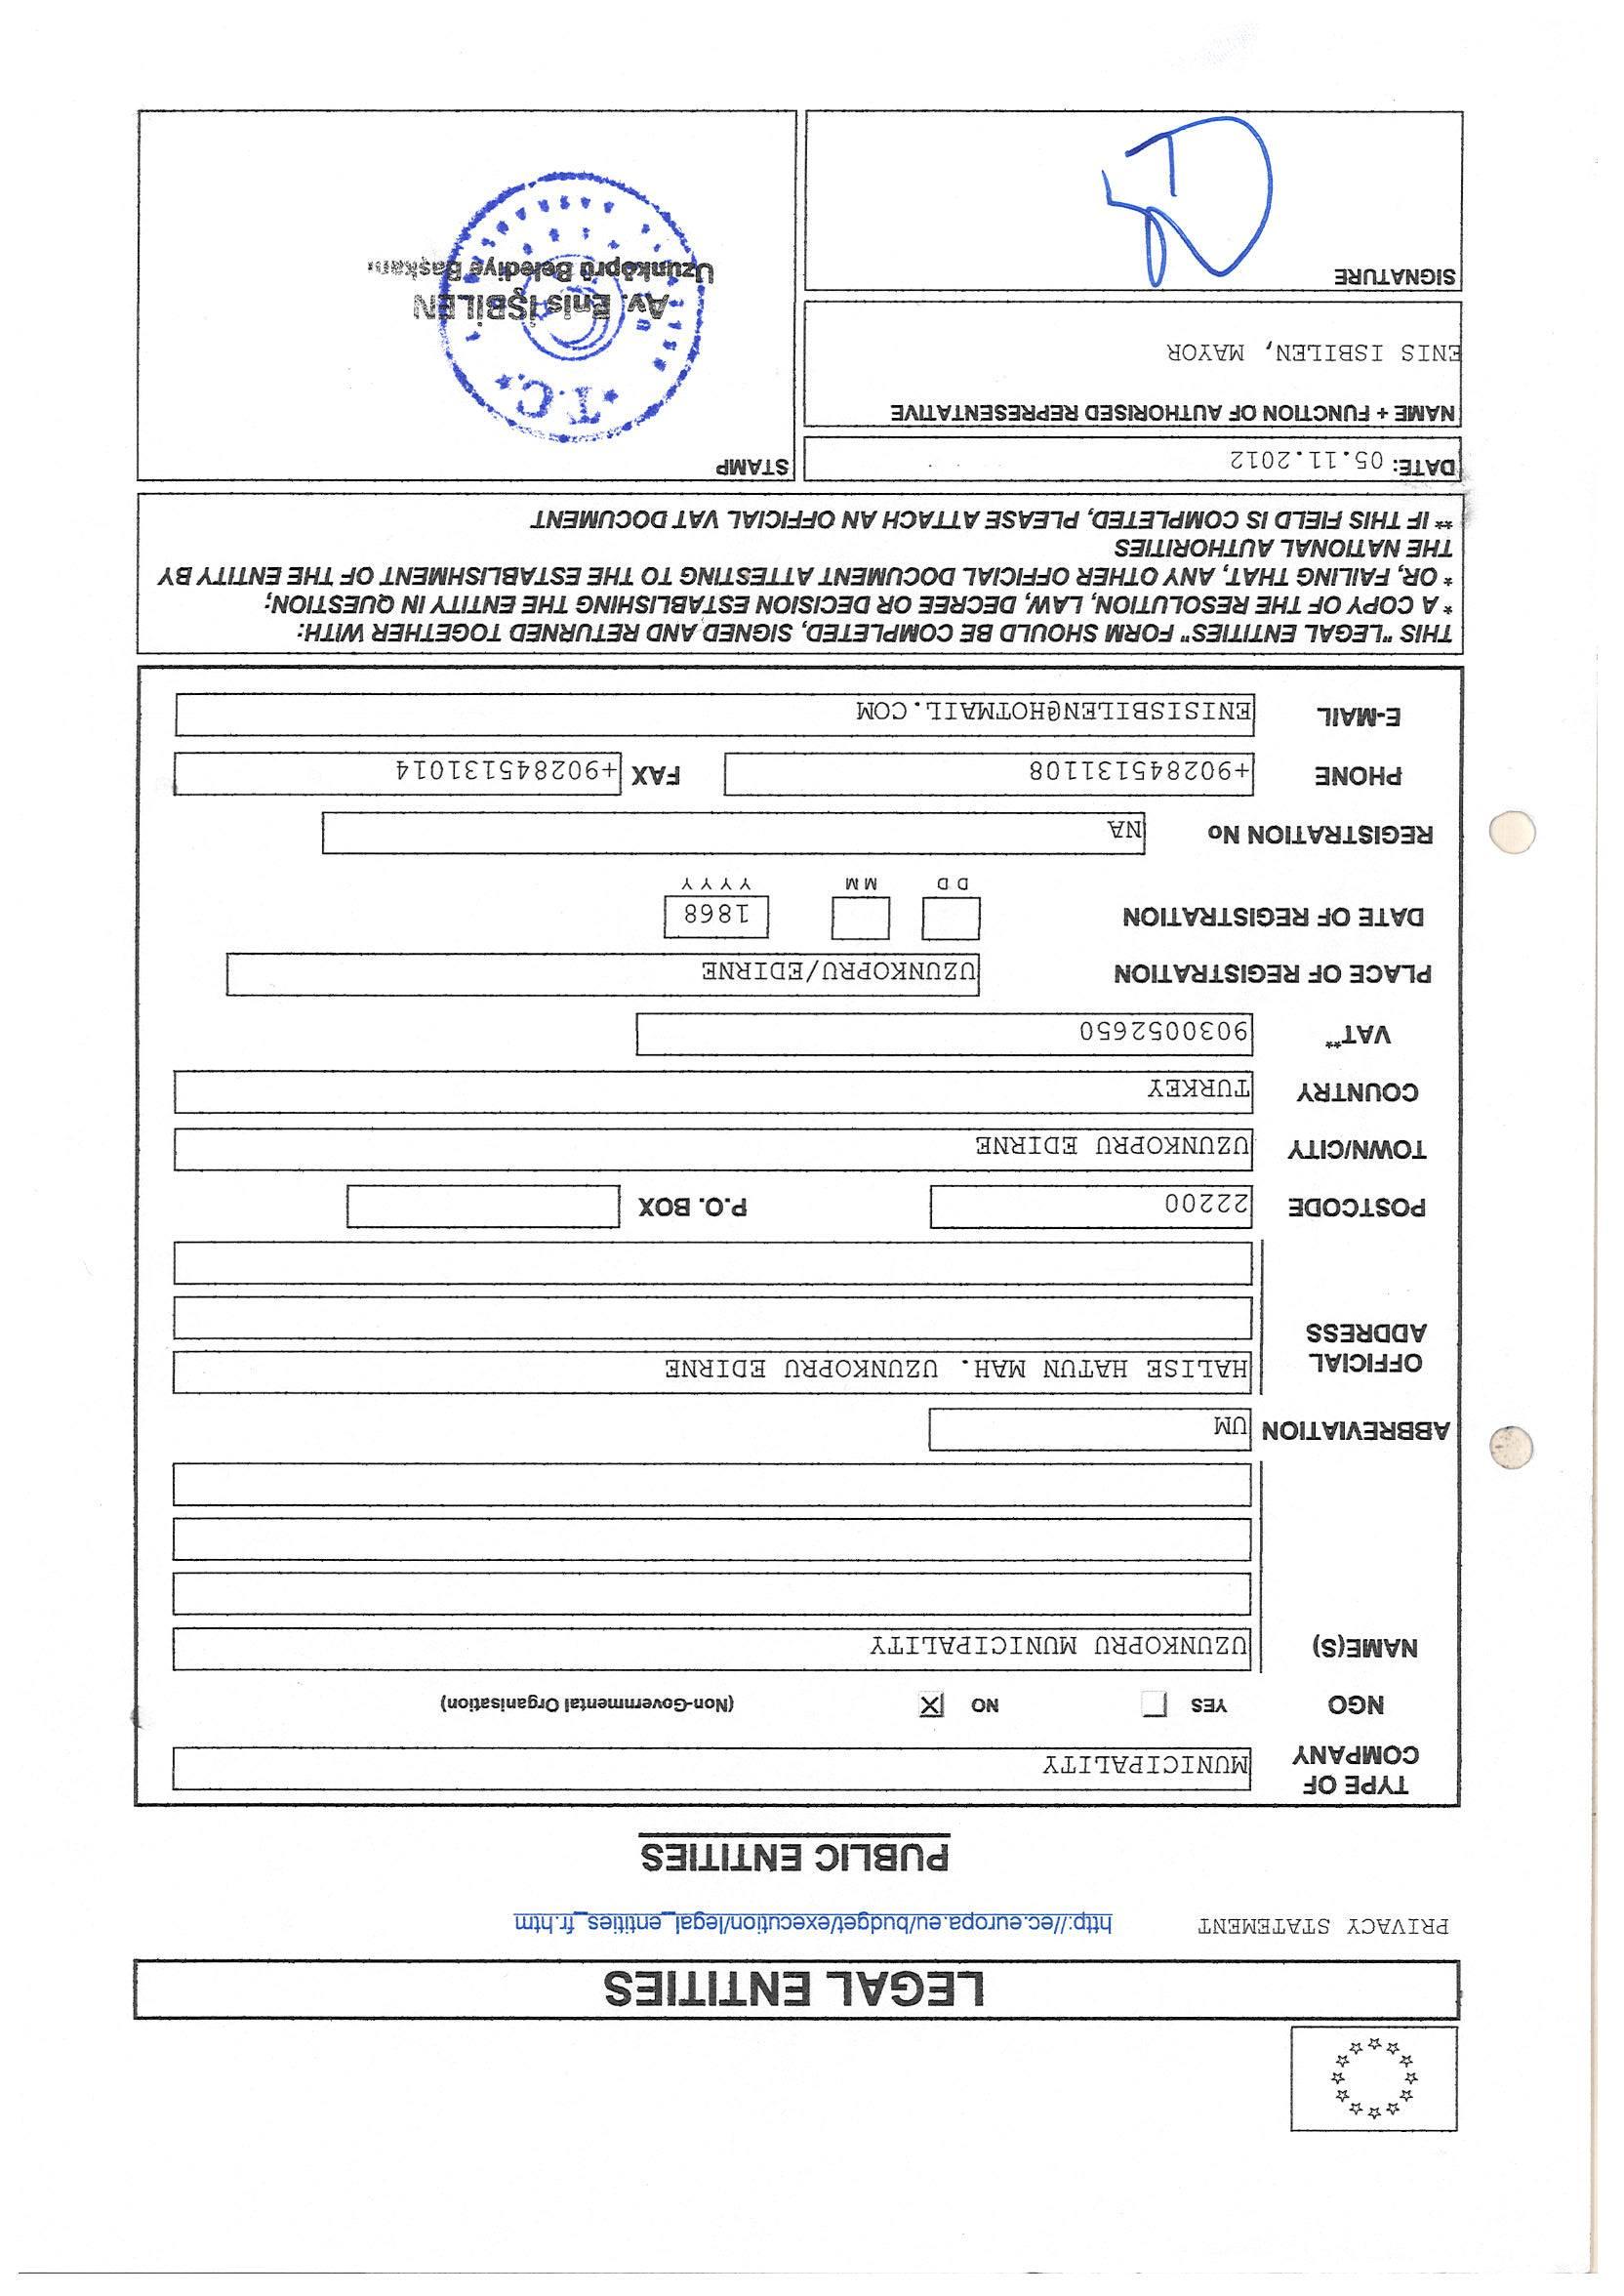 Legal Entity Sheet